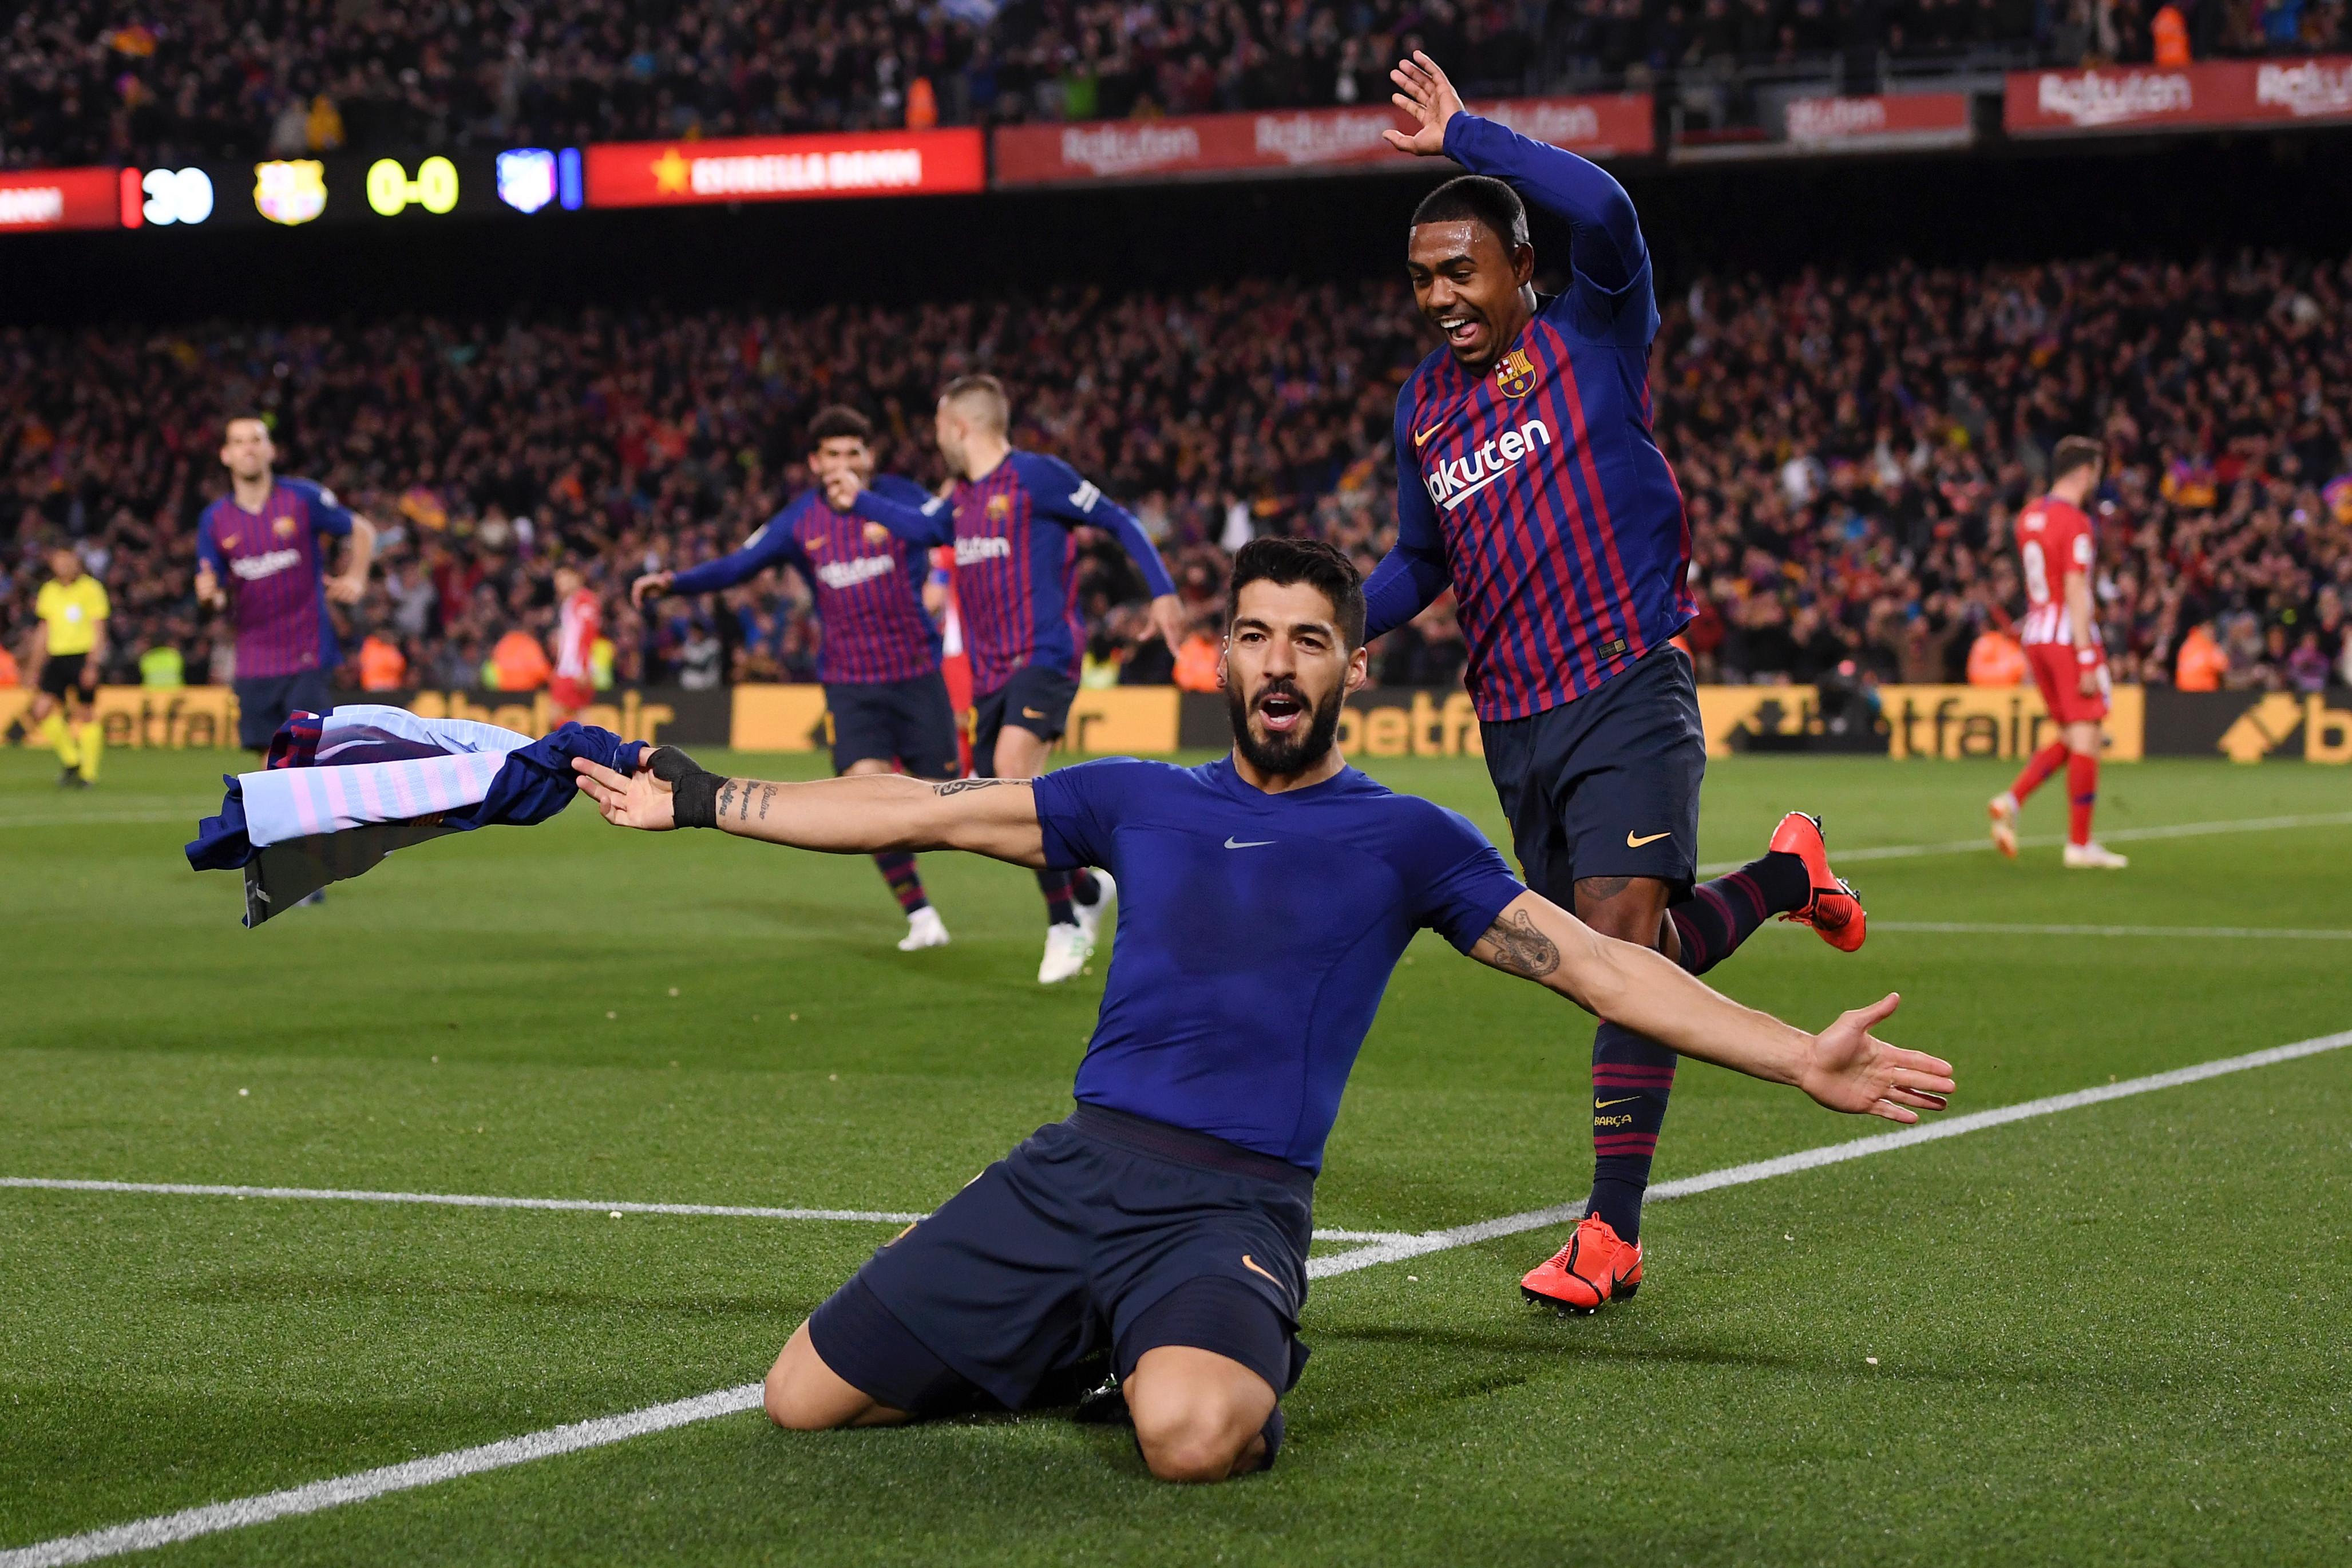 Luis Suarez ultimately got the breakthrough